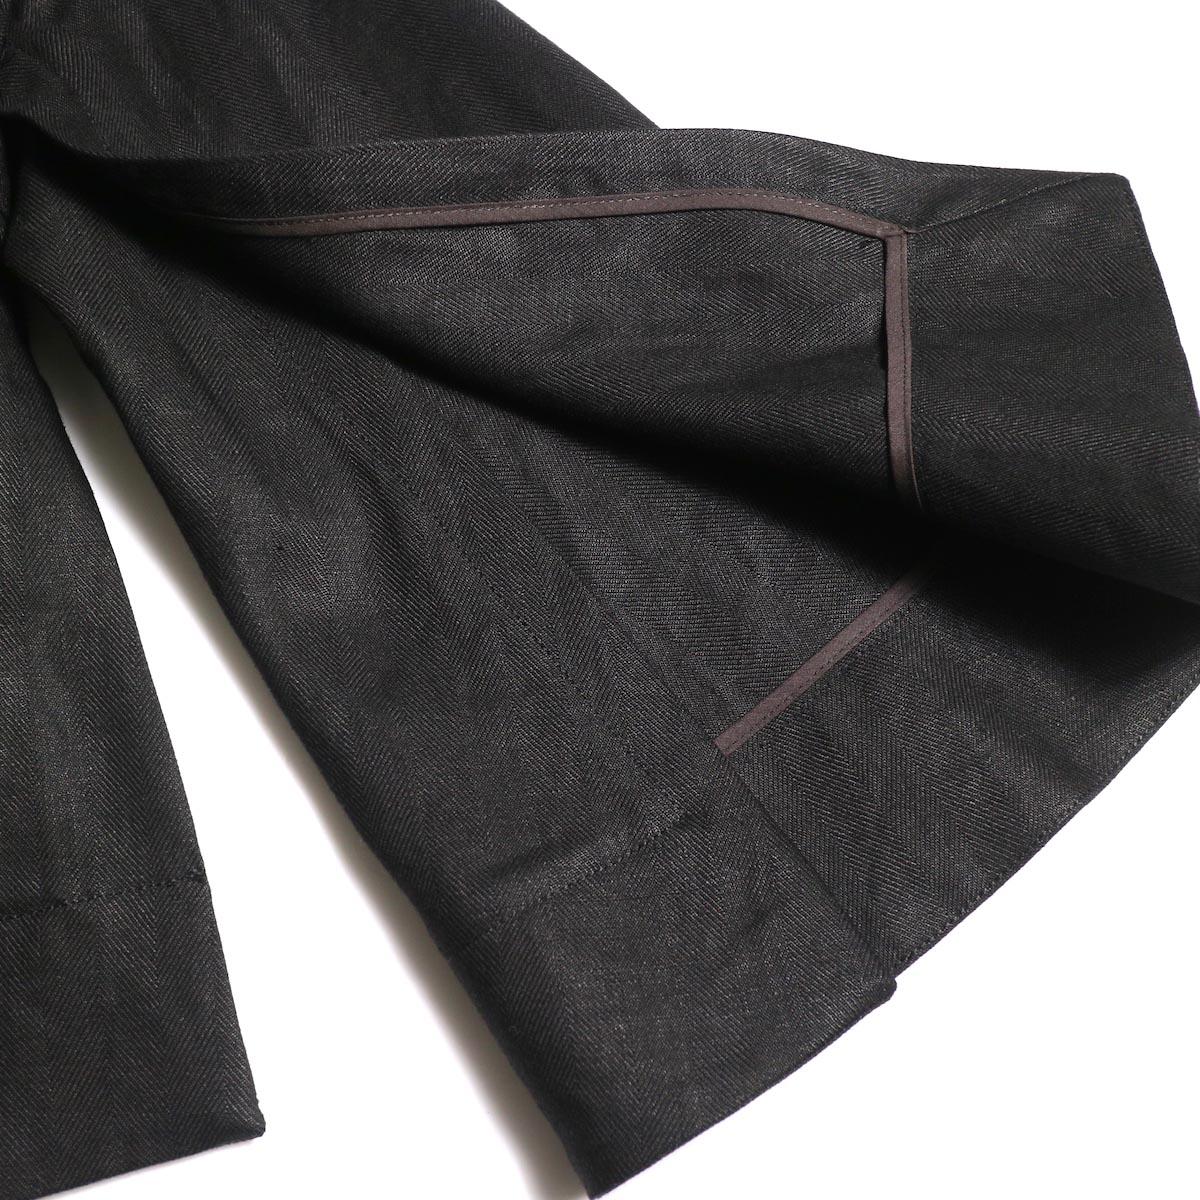 BLUEBIRD BOULEVARD / ヘリンボンリネンプルオーバー (Black)袖スリット